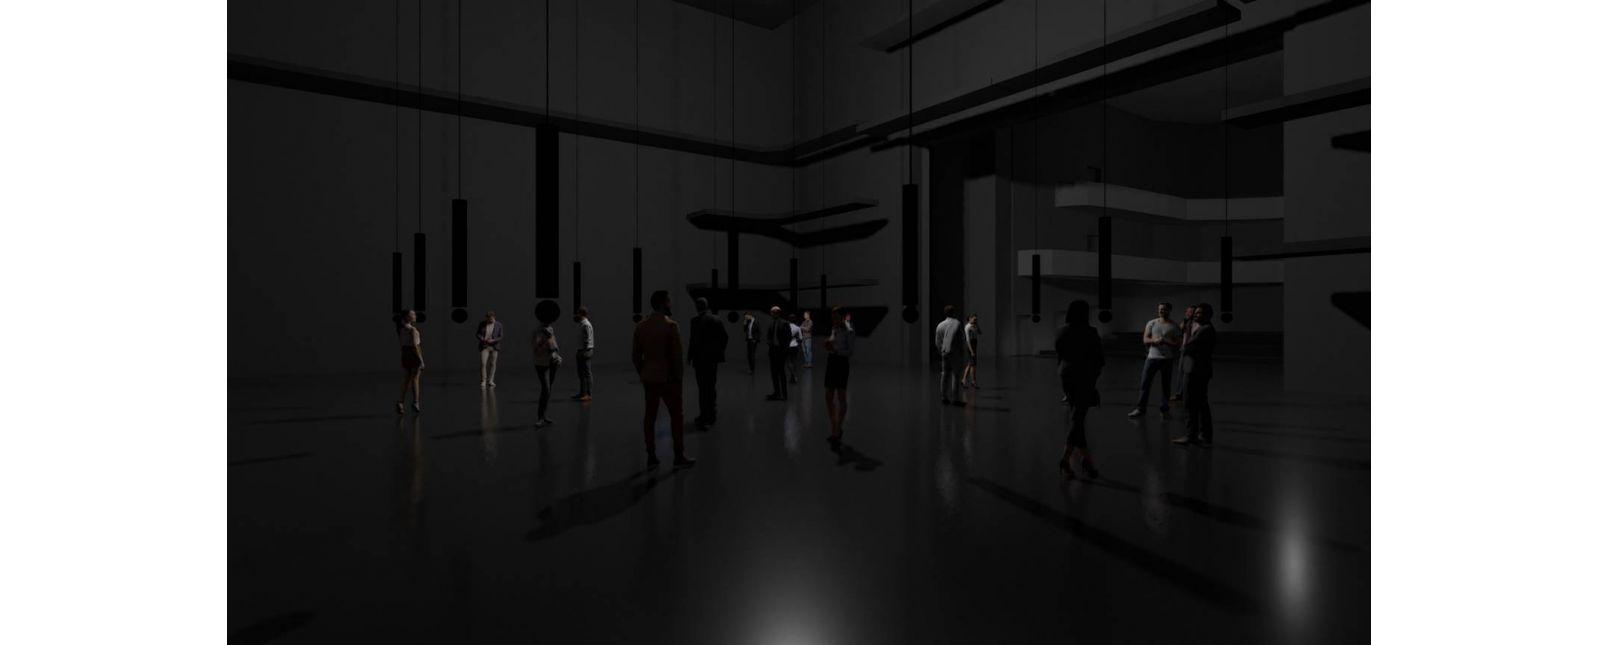 RUNDFUNK AETERNA ορχήστρα //  2019 // 3D-Stills: Jan-Peter E.R. Sonntag & N-solab